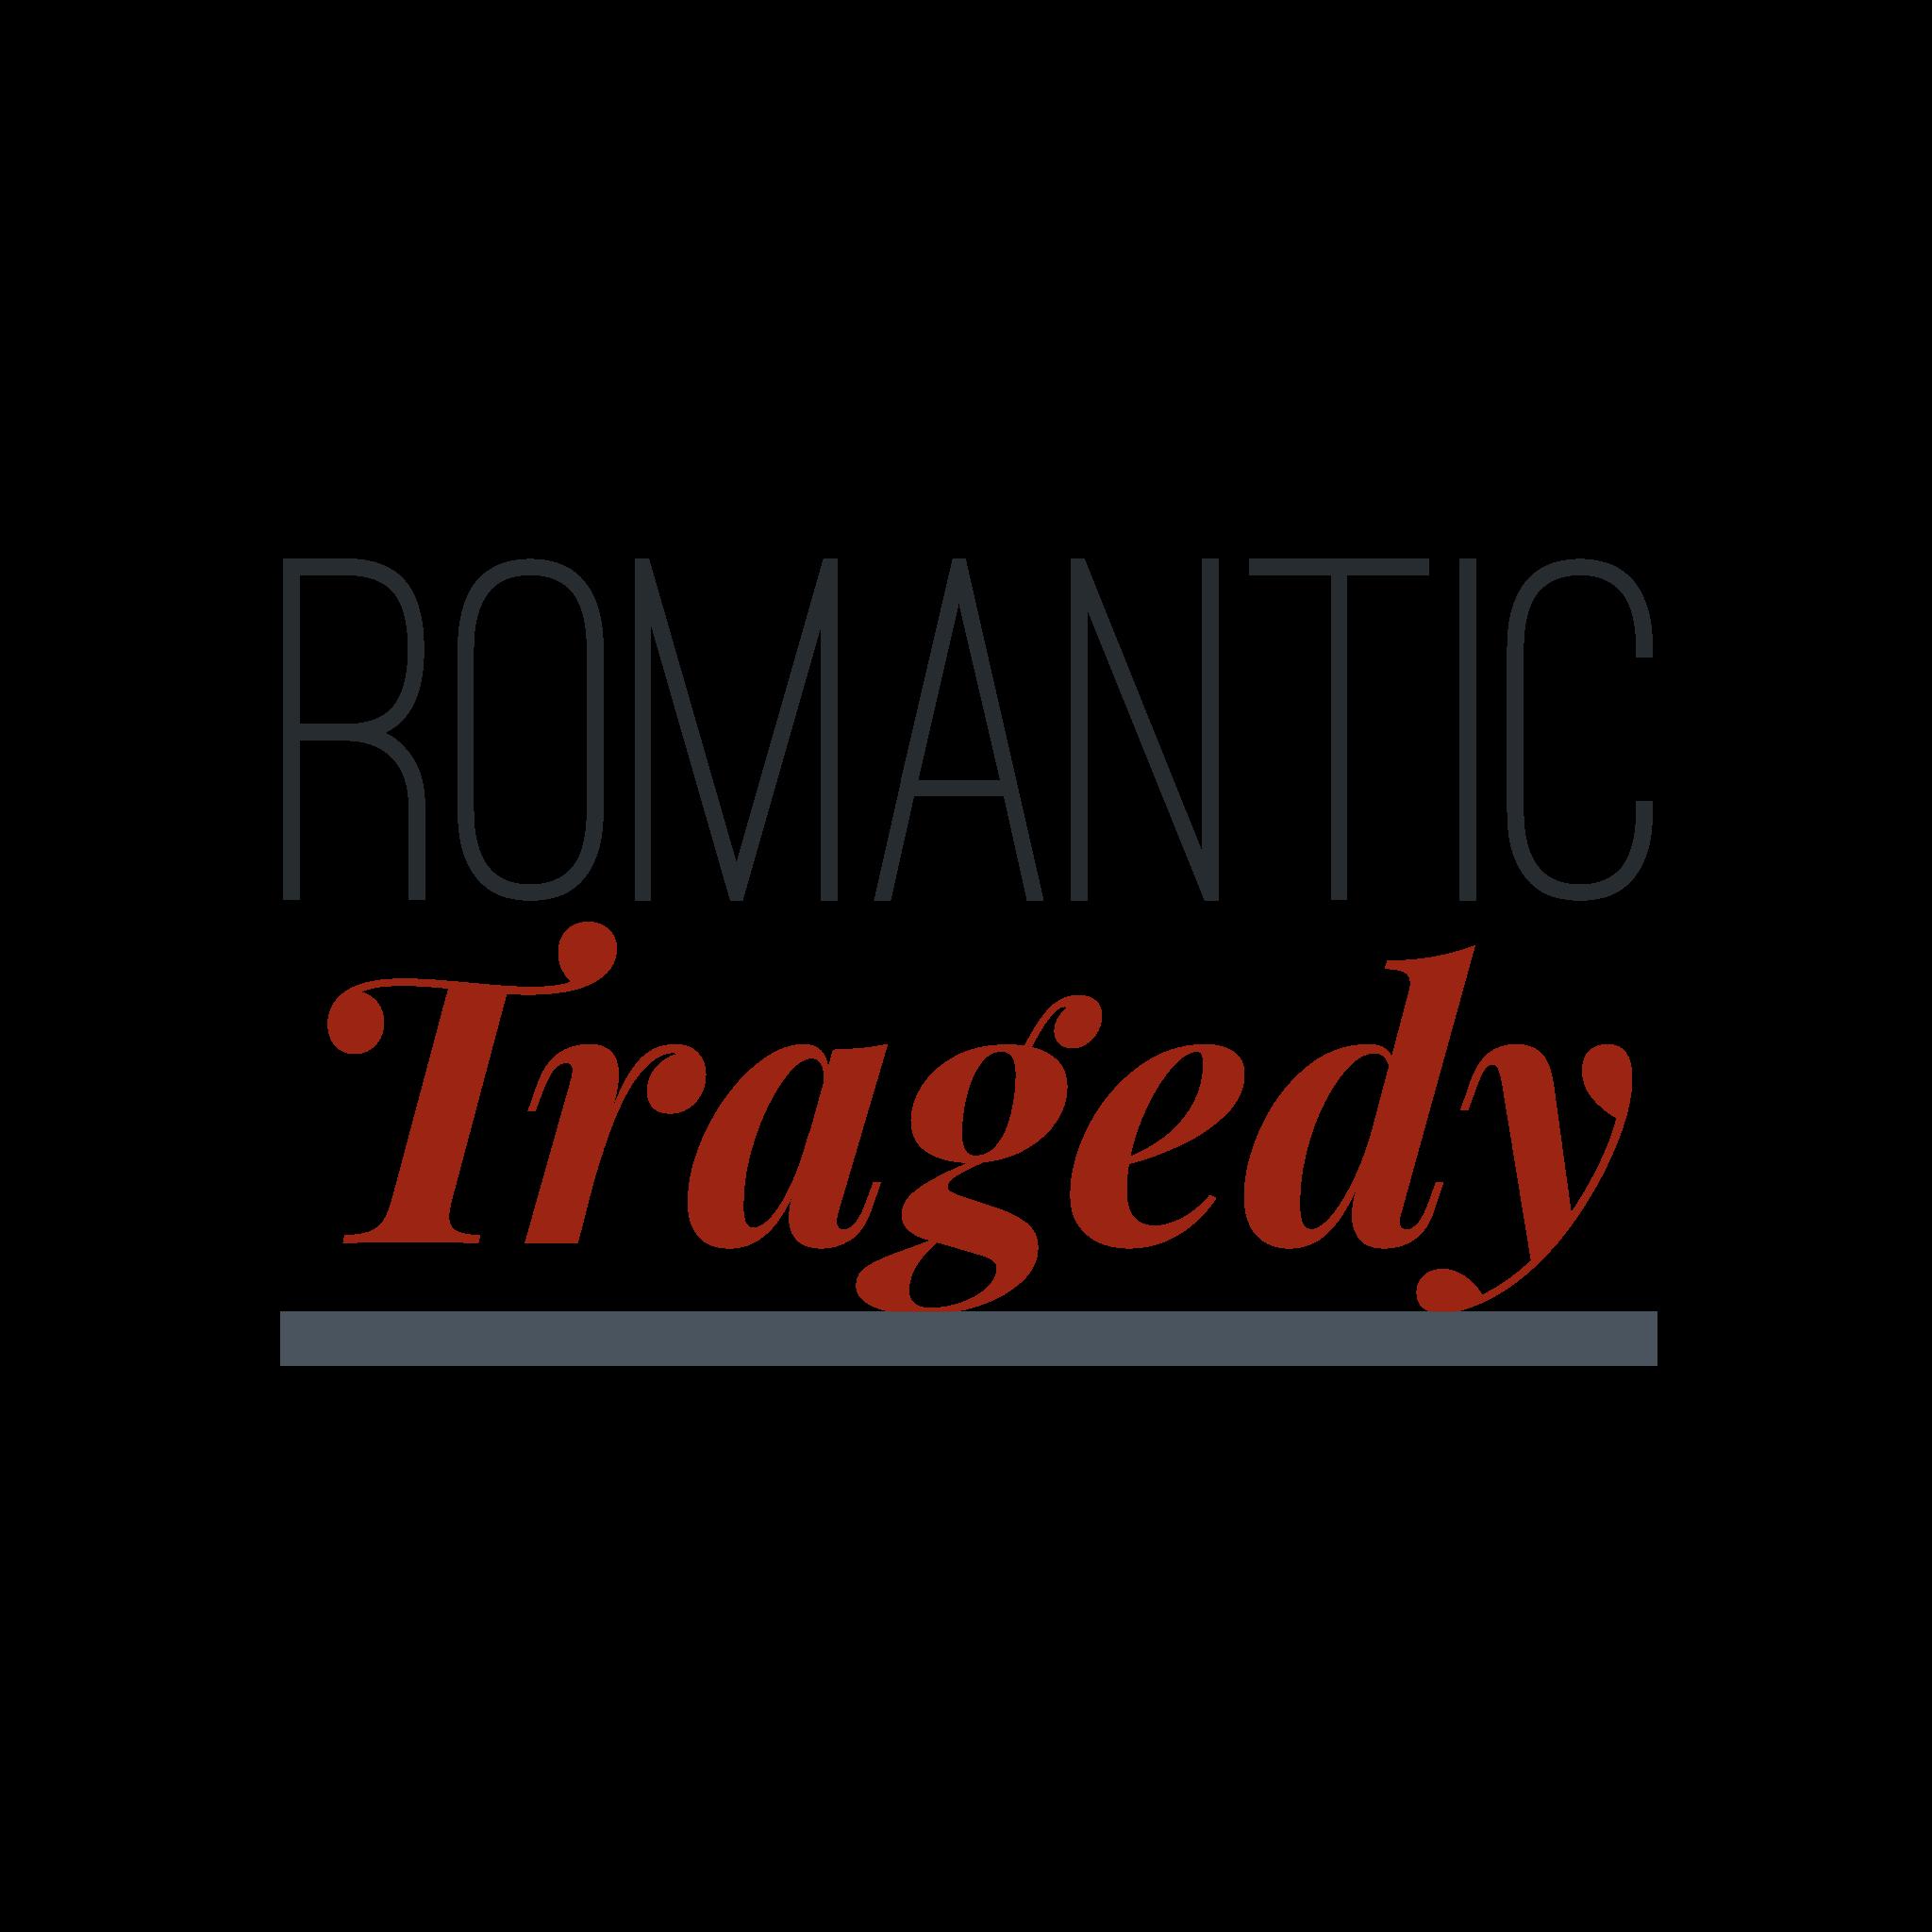 Romantic Tragedy